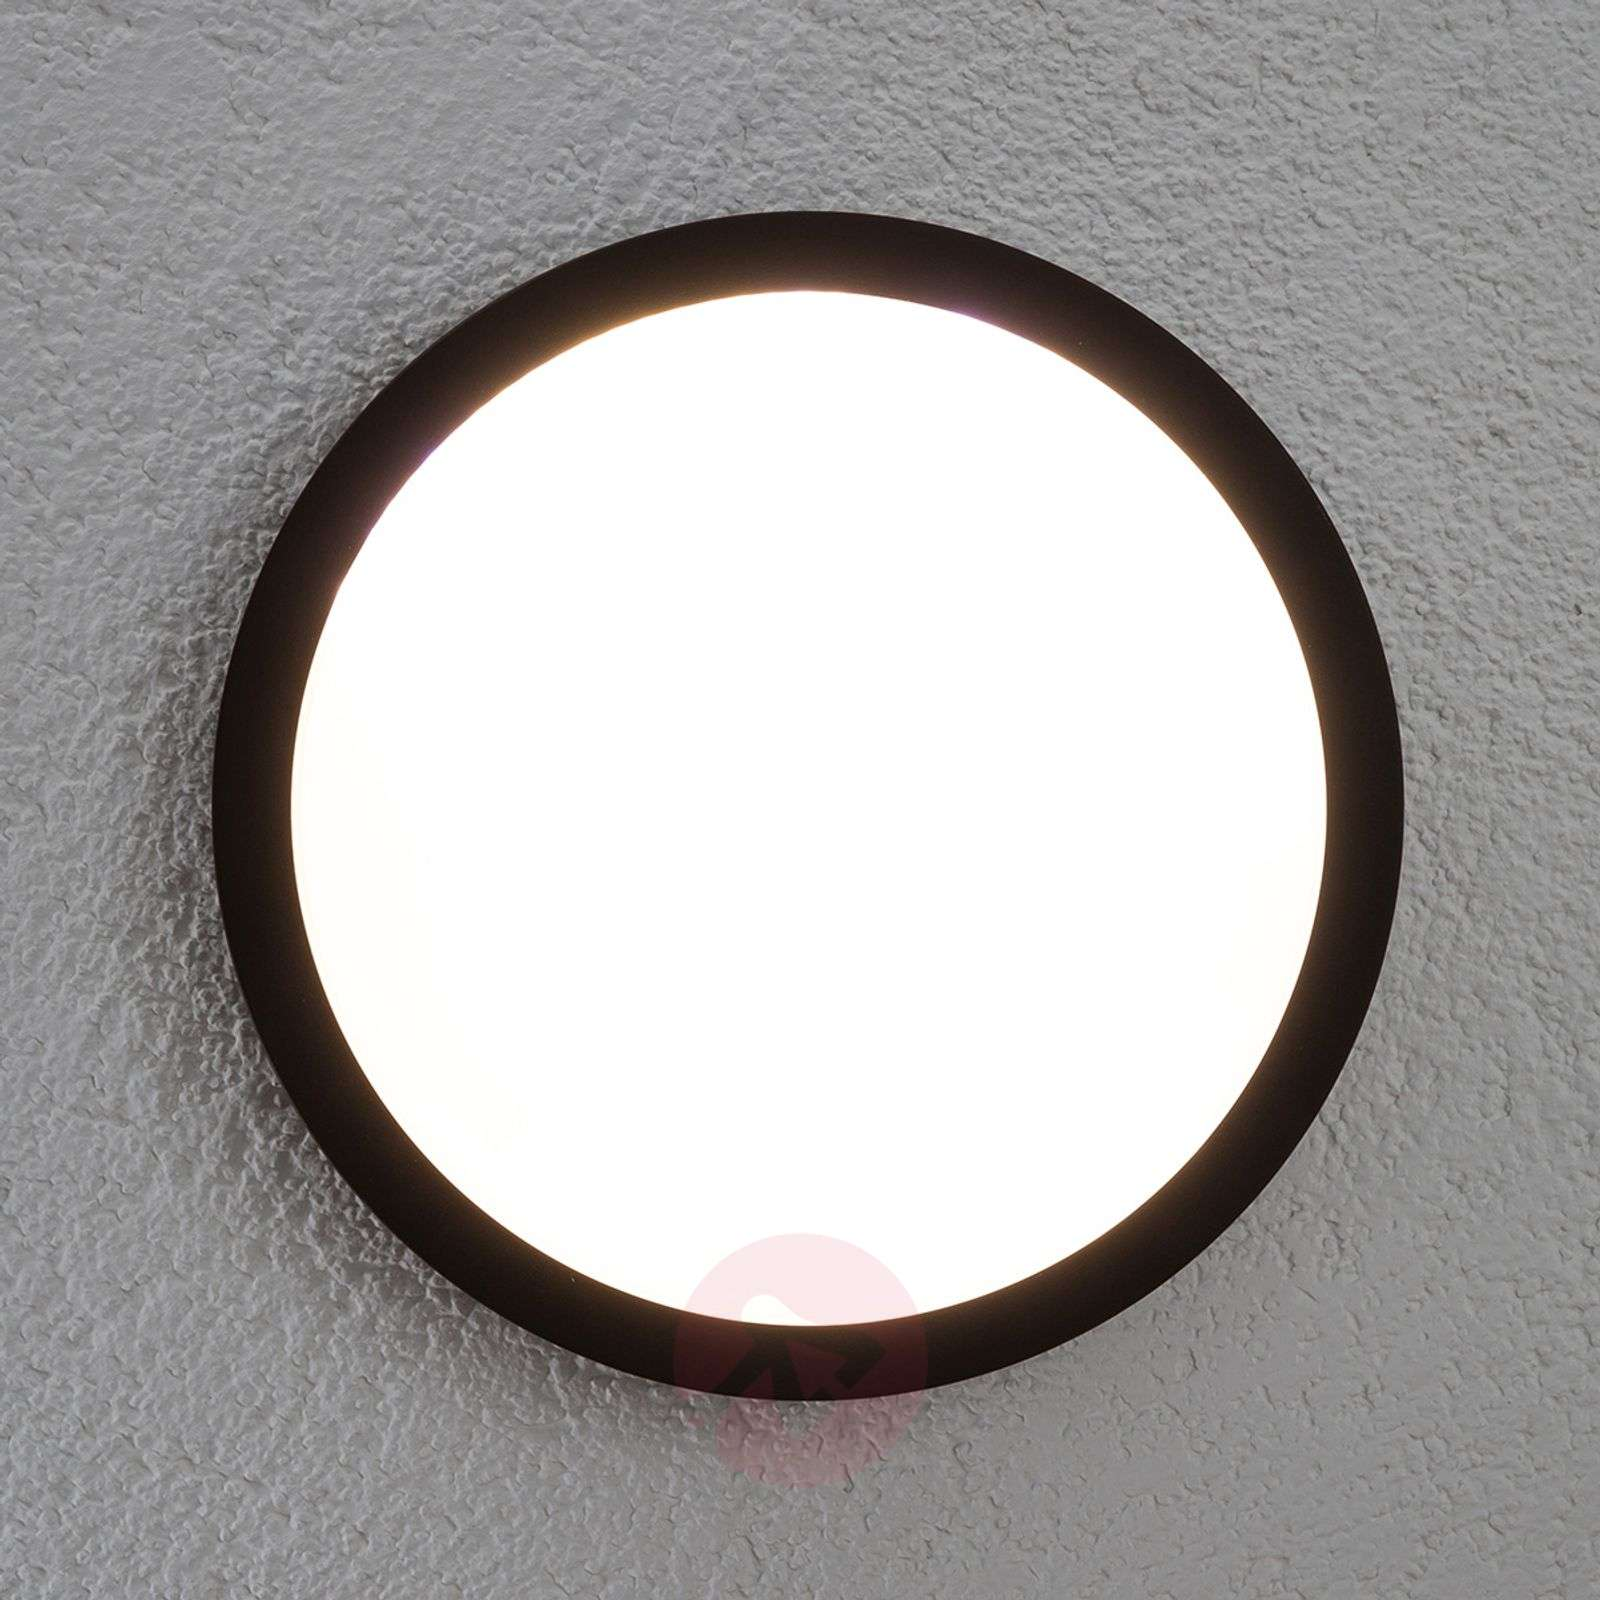 Outdoor LED ceiling light Benton-9619034-01